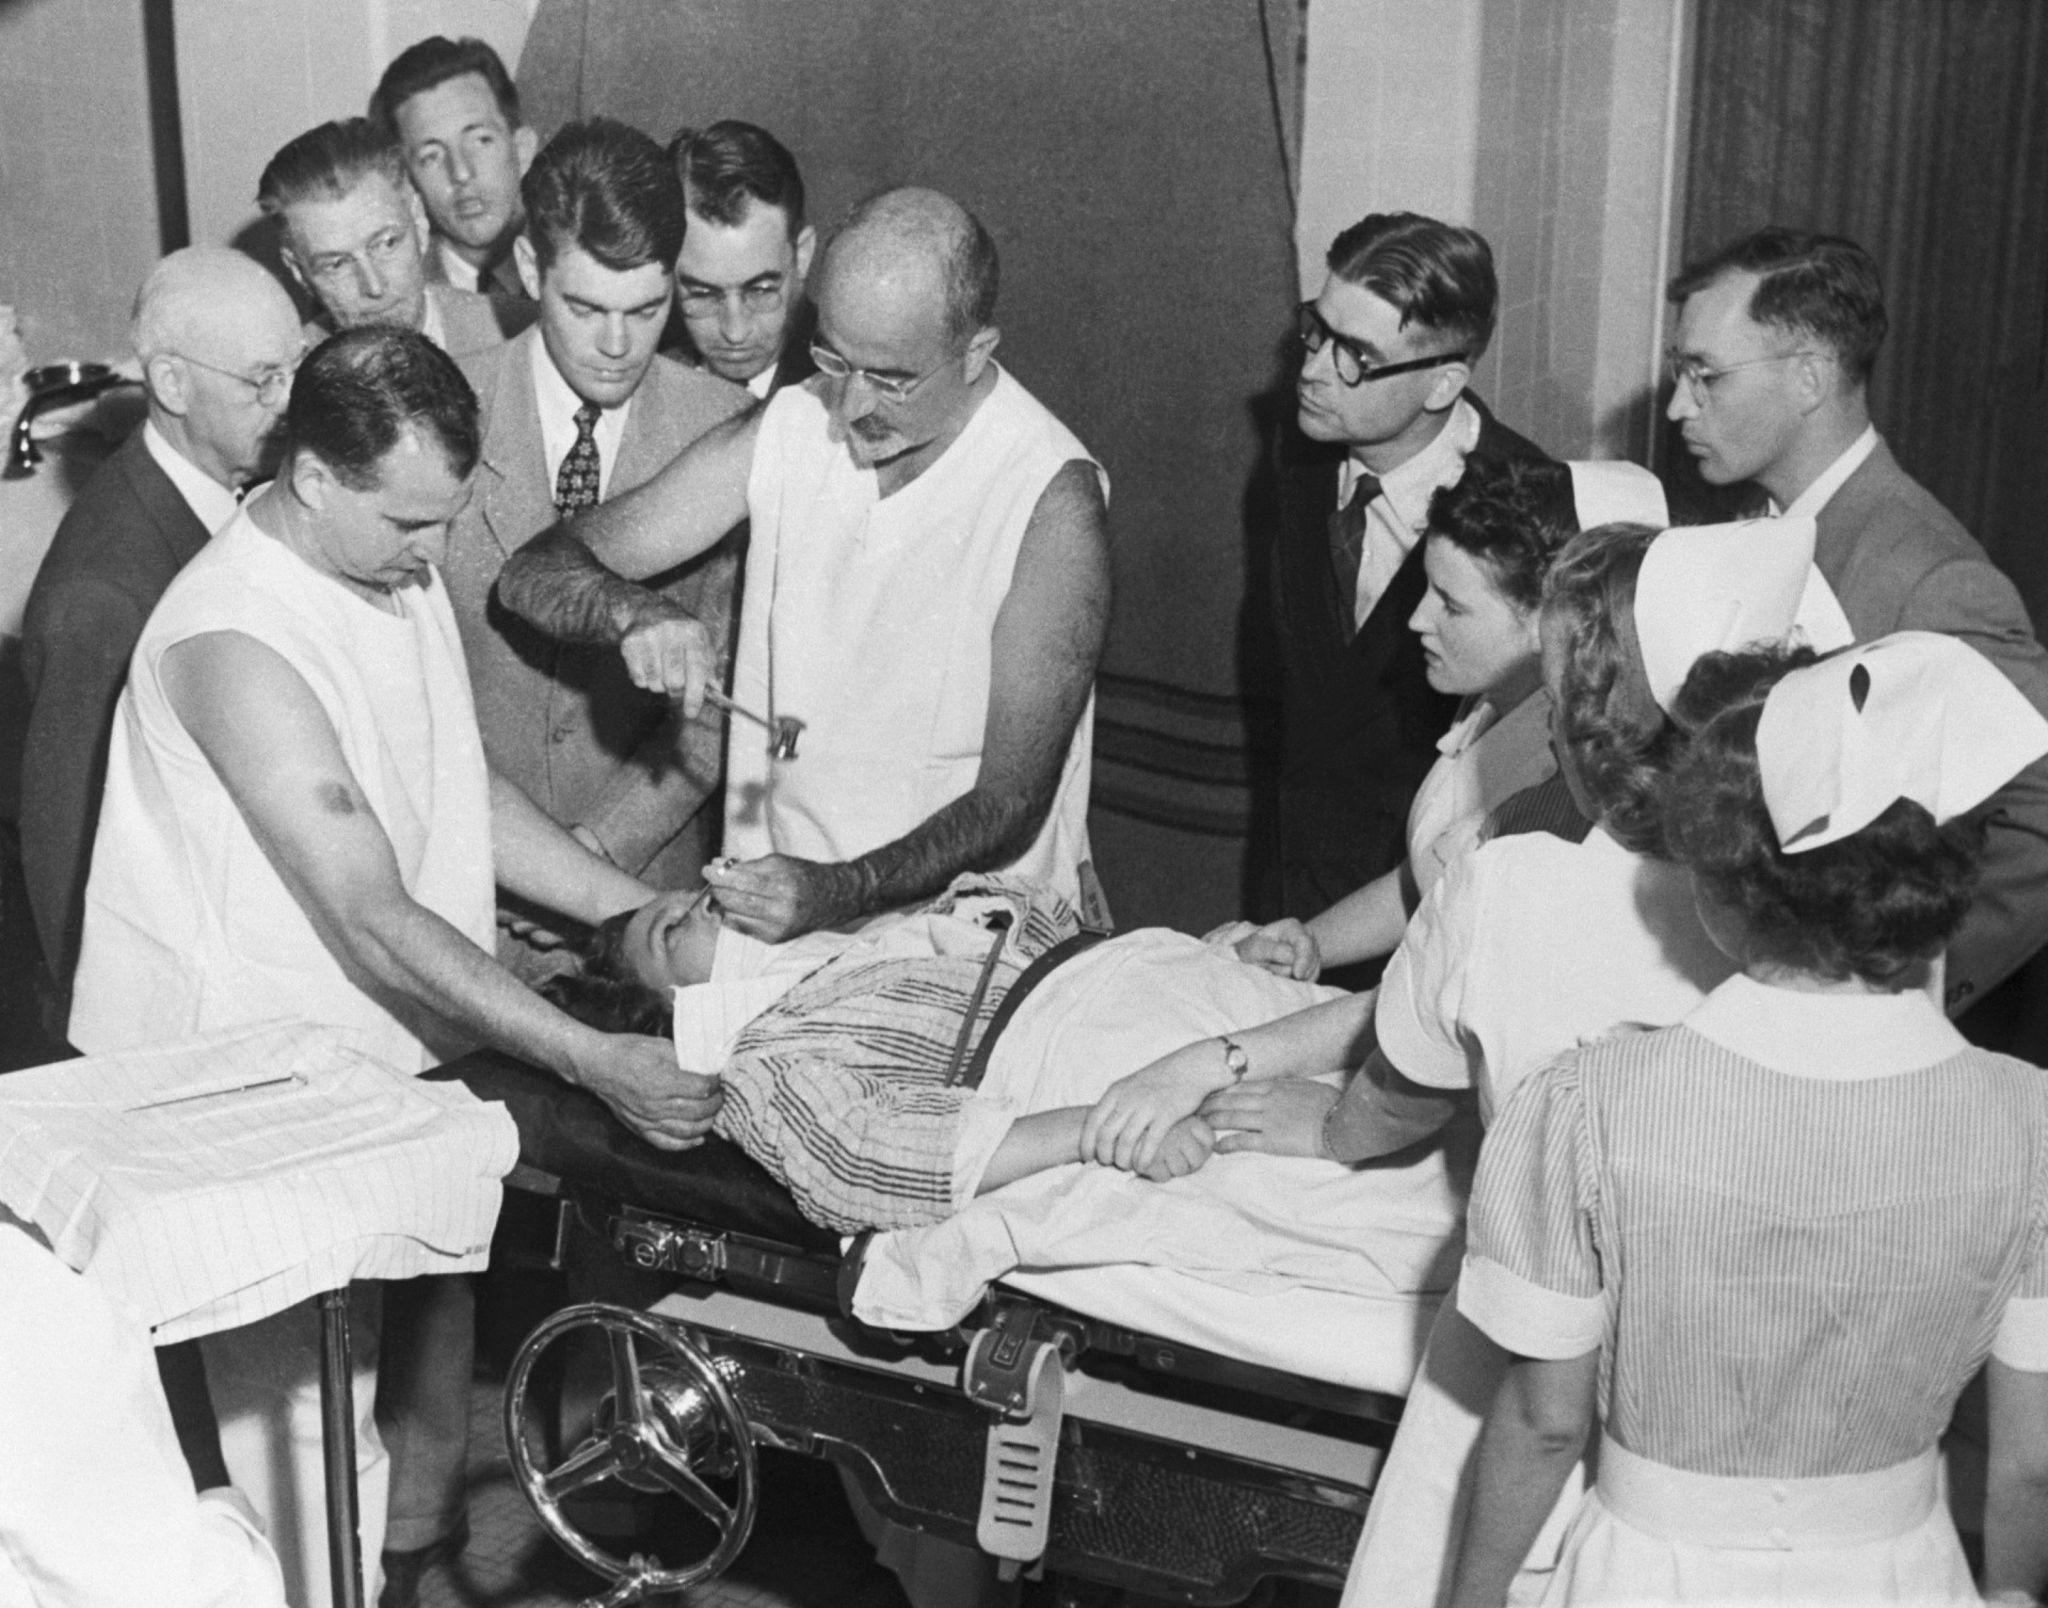 Walter Freeman demonstrating his transorbital lobotomy technique in 1949